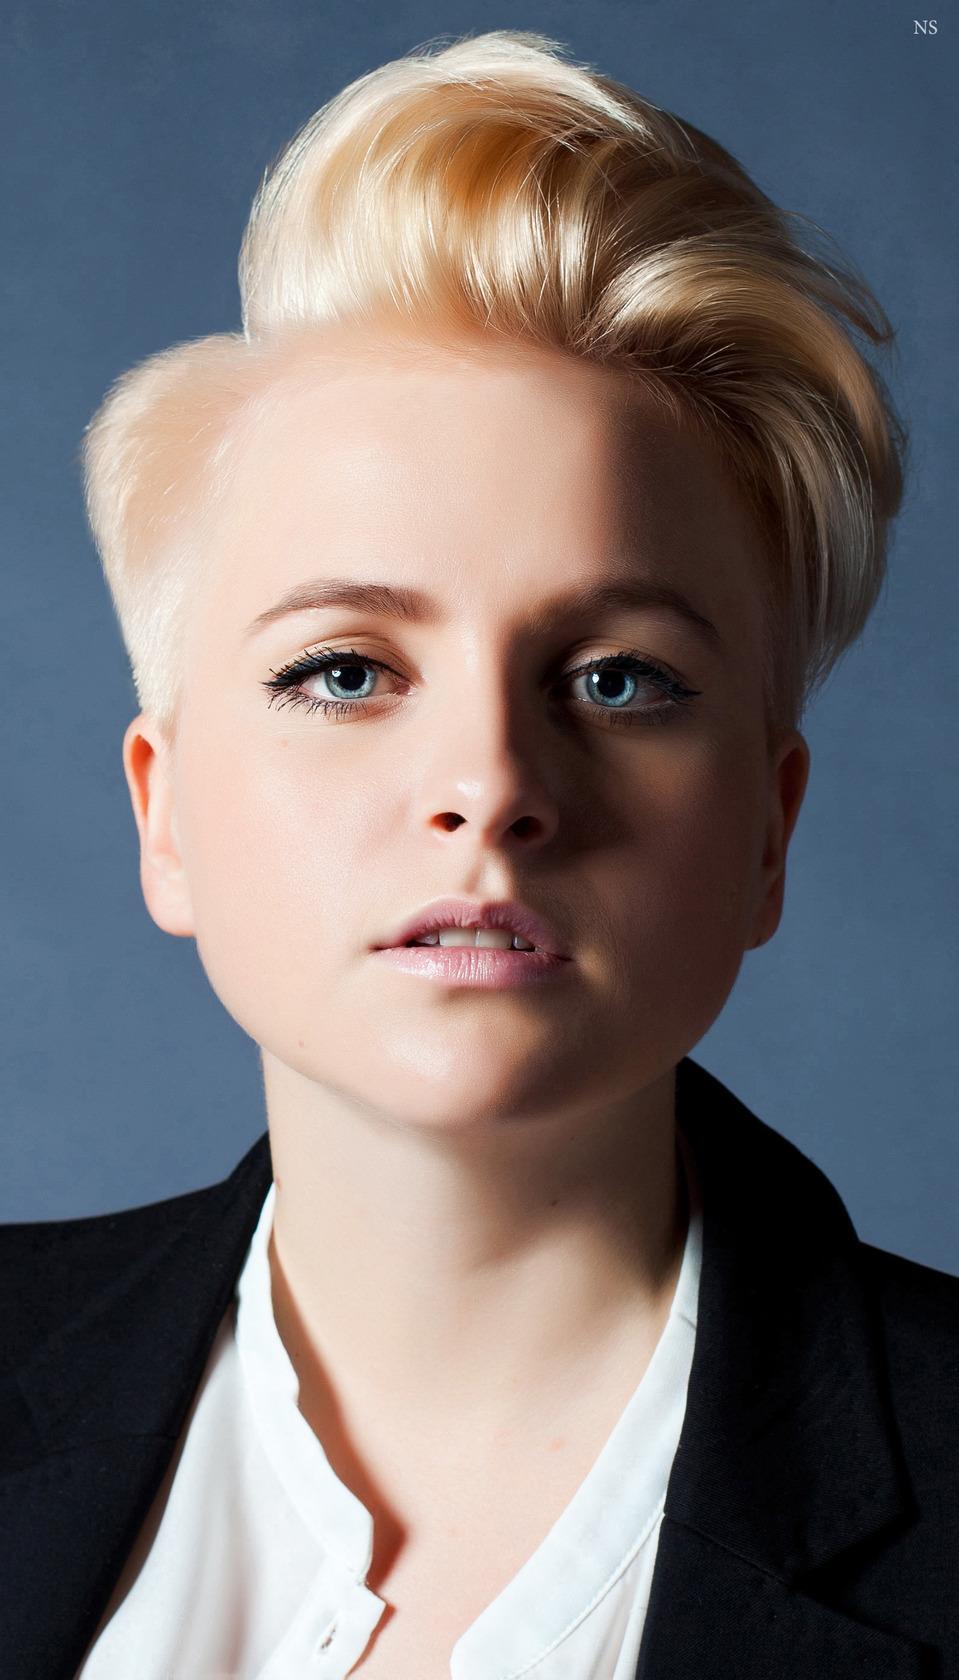 Manlike woman | manlike woman, blond, green eyes, full-face portrait